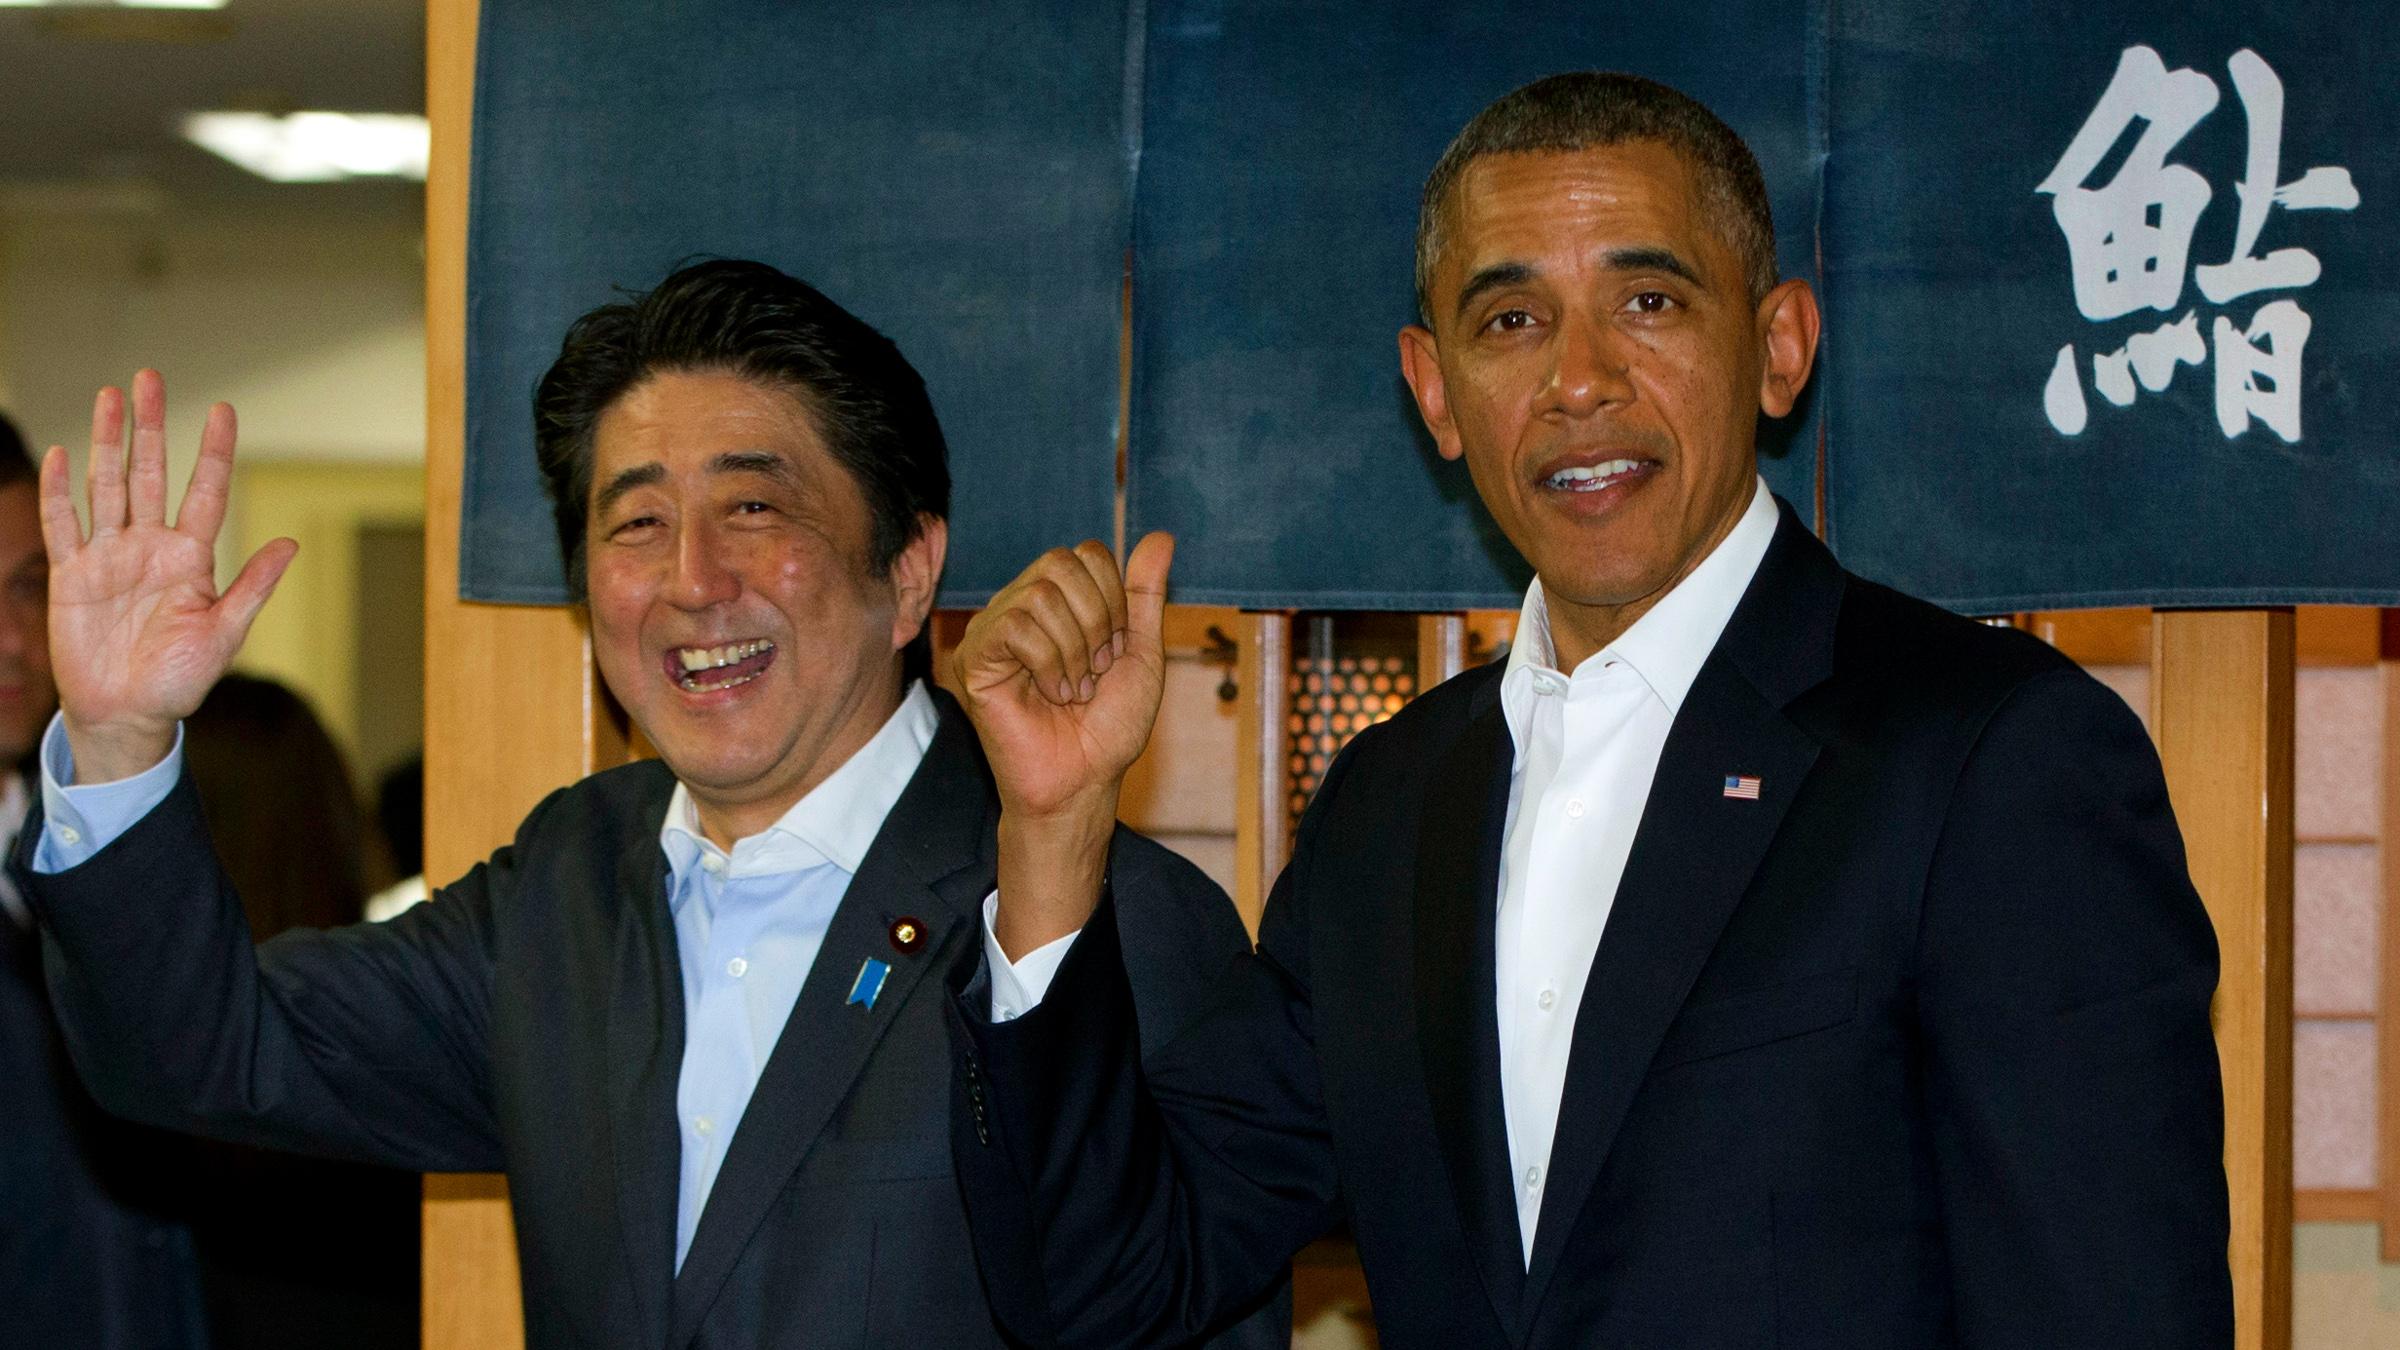 President Barack Obama and Japanese Prime Minister Shinzo Abe depart Sukiyabashi Jiro sushi restaurant inTokyo, Wednesday, April 23, 2014. President Obama begins a four-country trip through the Asia-Pacific region.